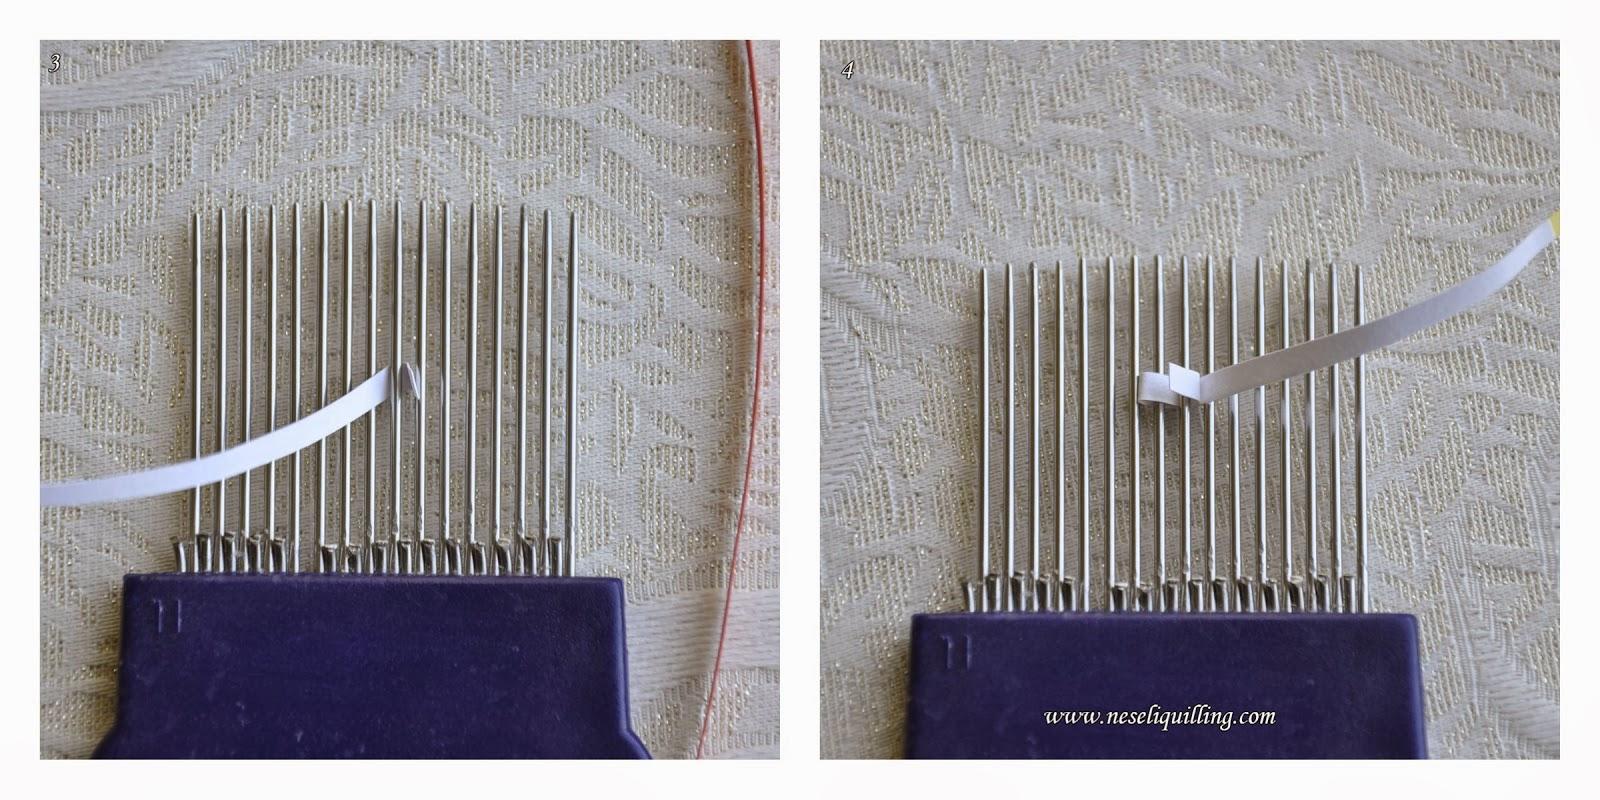 quilling tarakla çiçek yapımı - quilling comb flower tutorial